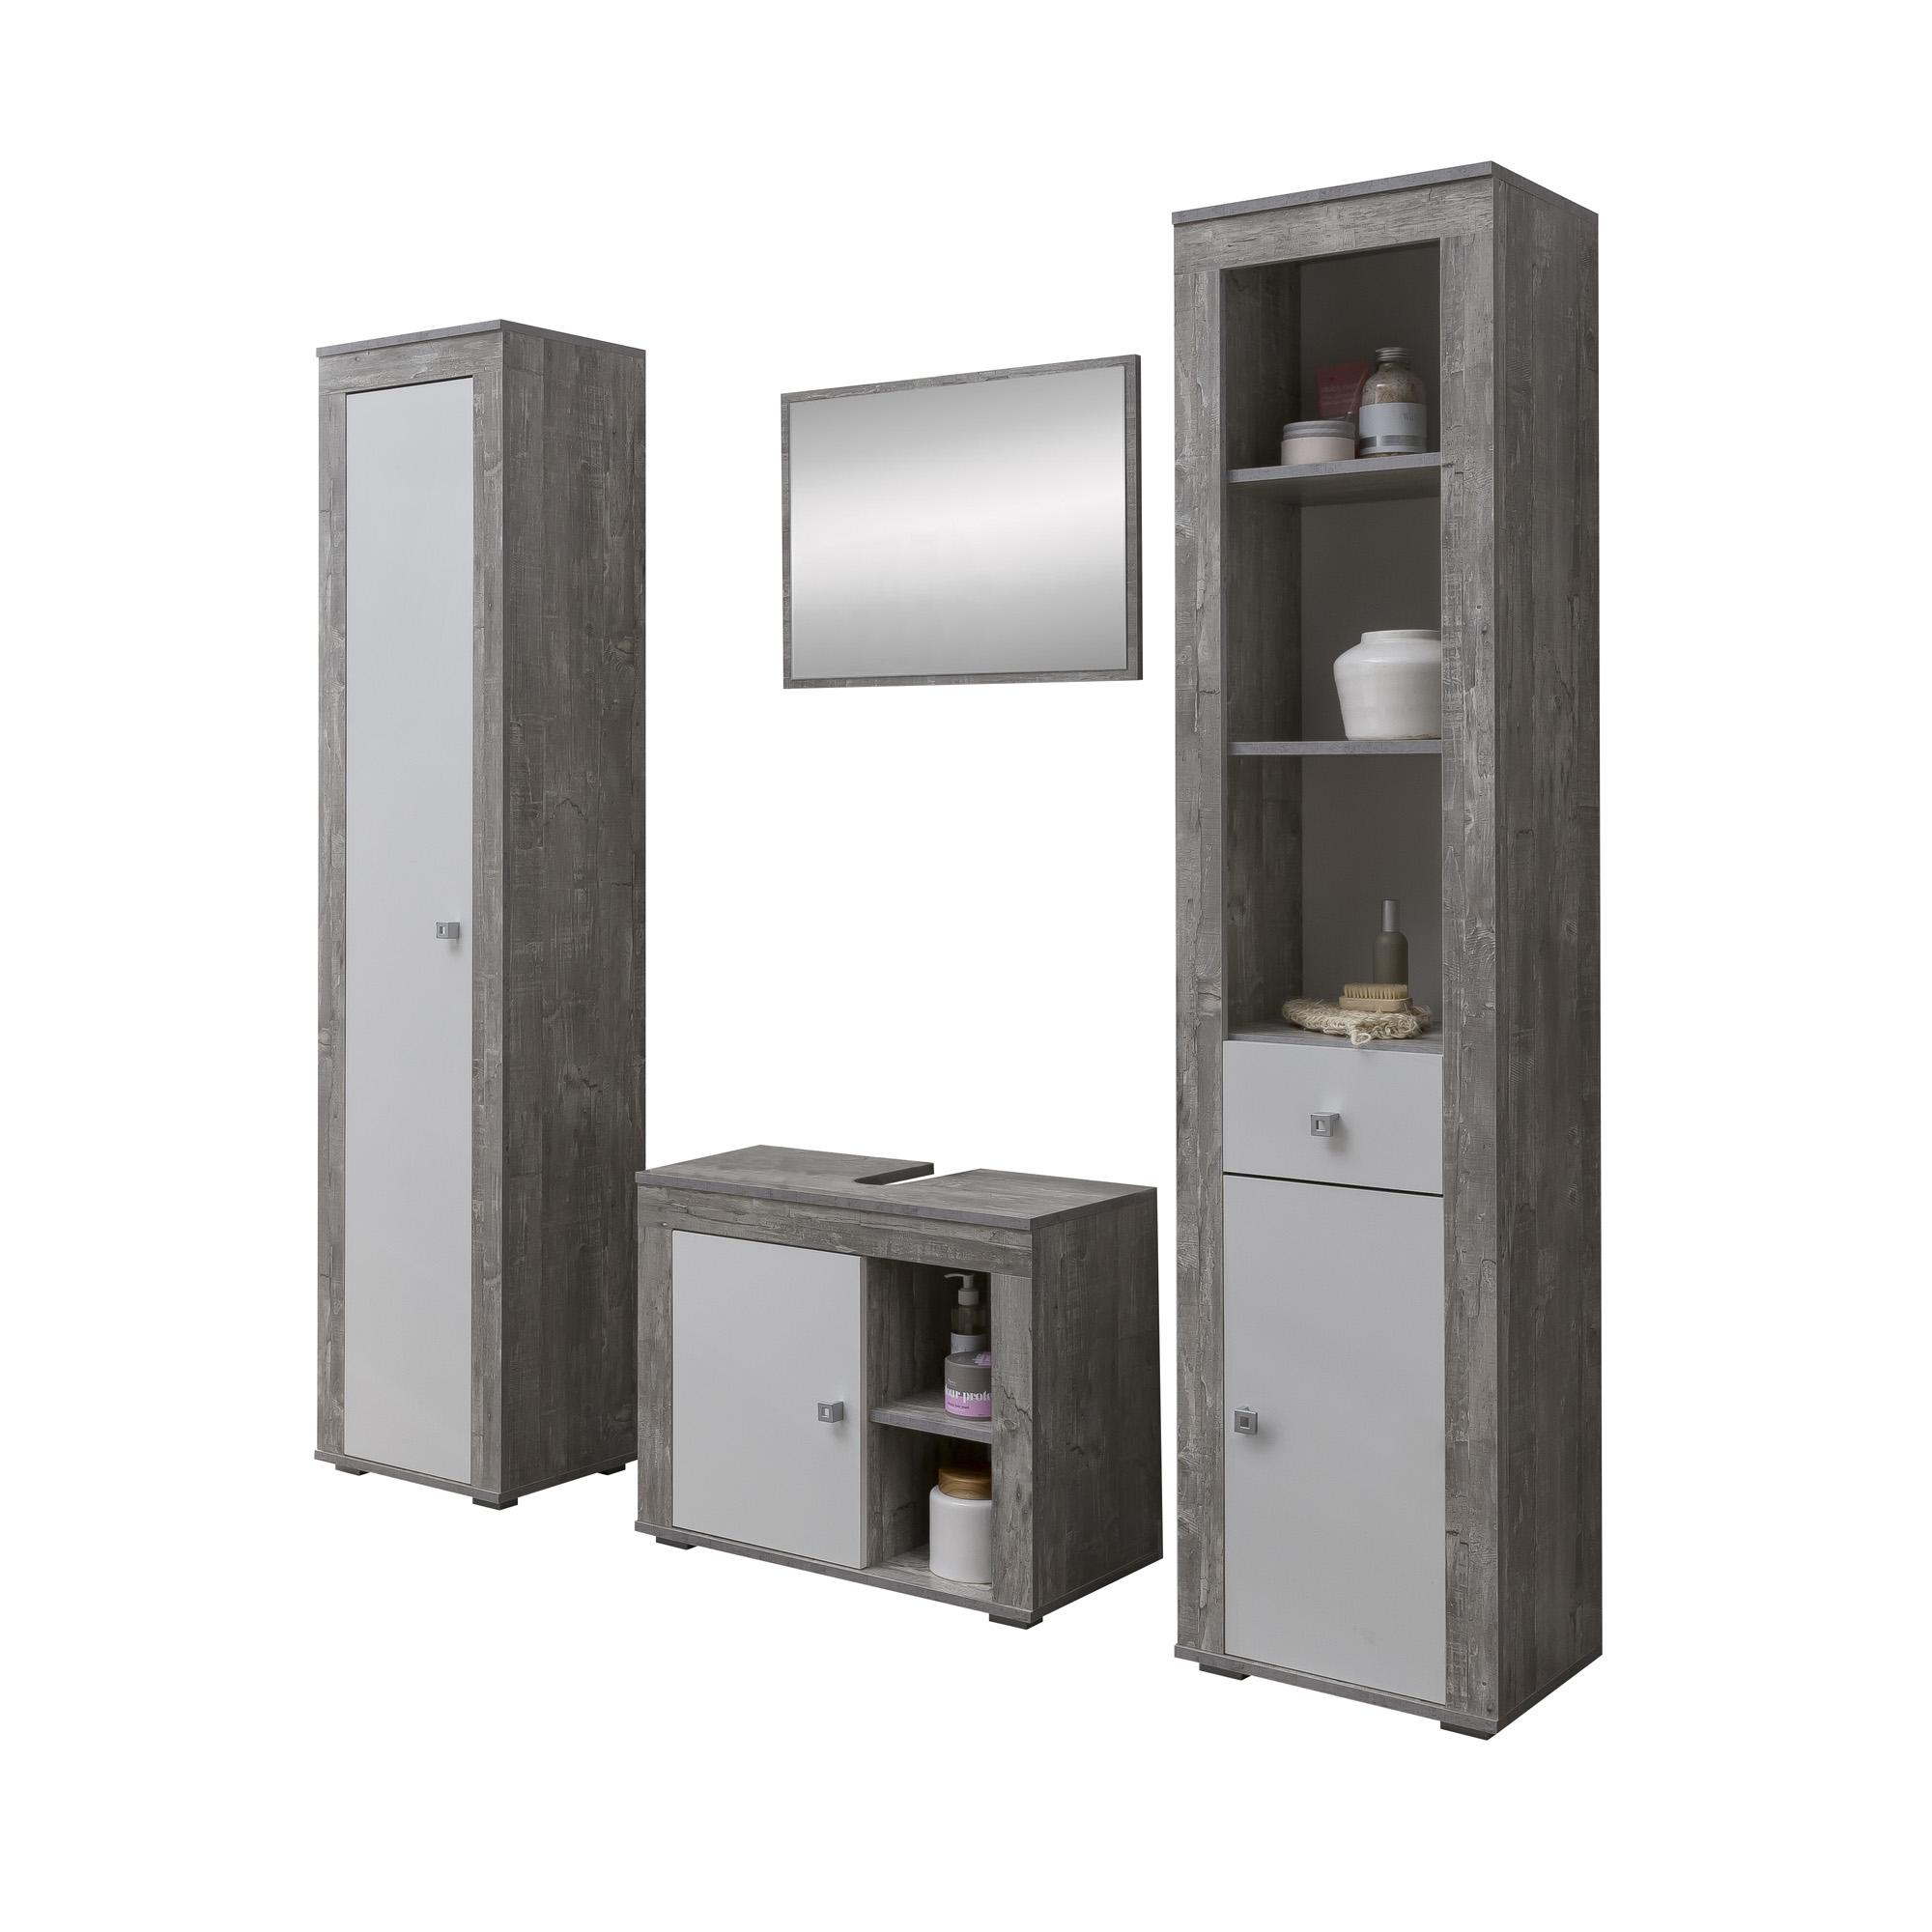 Full Size of Badmbel Set Rgen 4 Teilig 145 Cm Breit Wei Betongrau Ausgefallene Betten Möbelgriffe Küche Wohnzimmer Ausgefallene Möbelgriffe